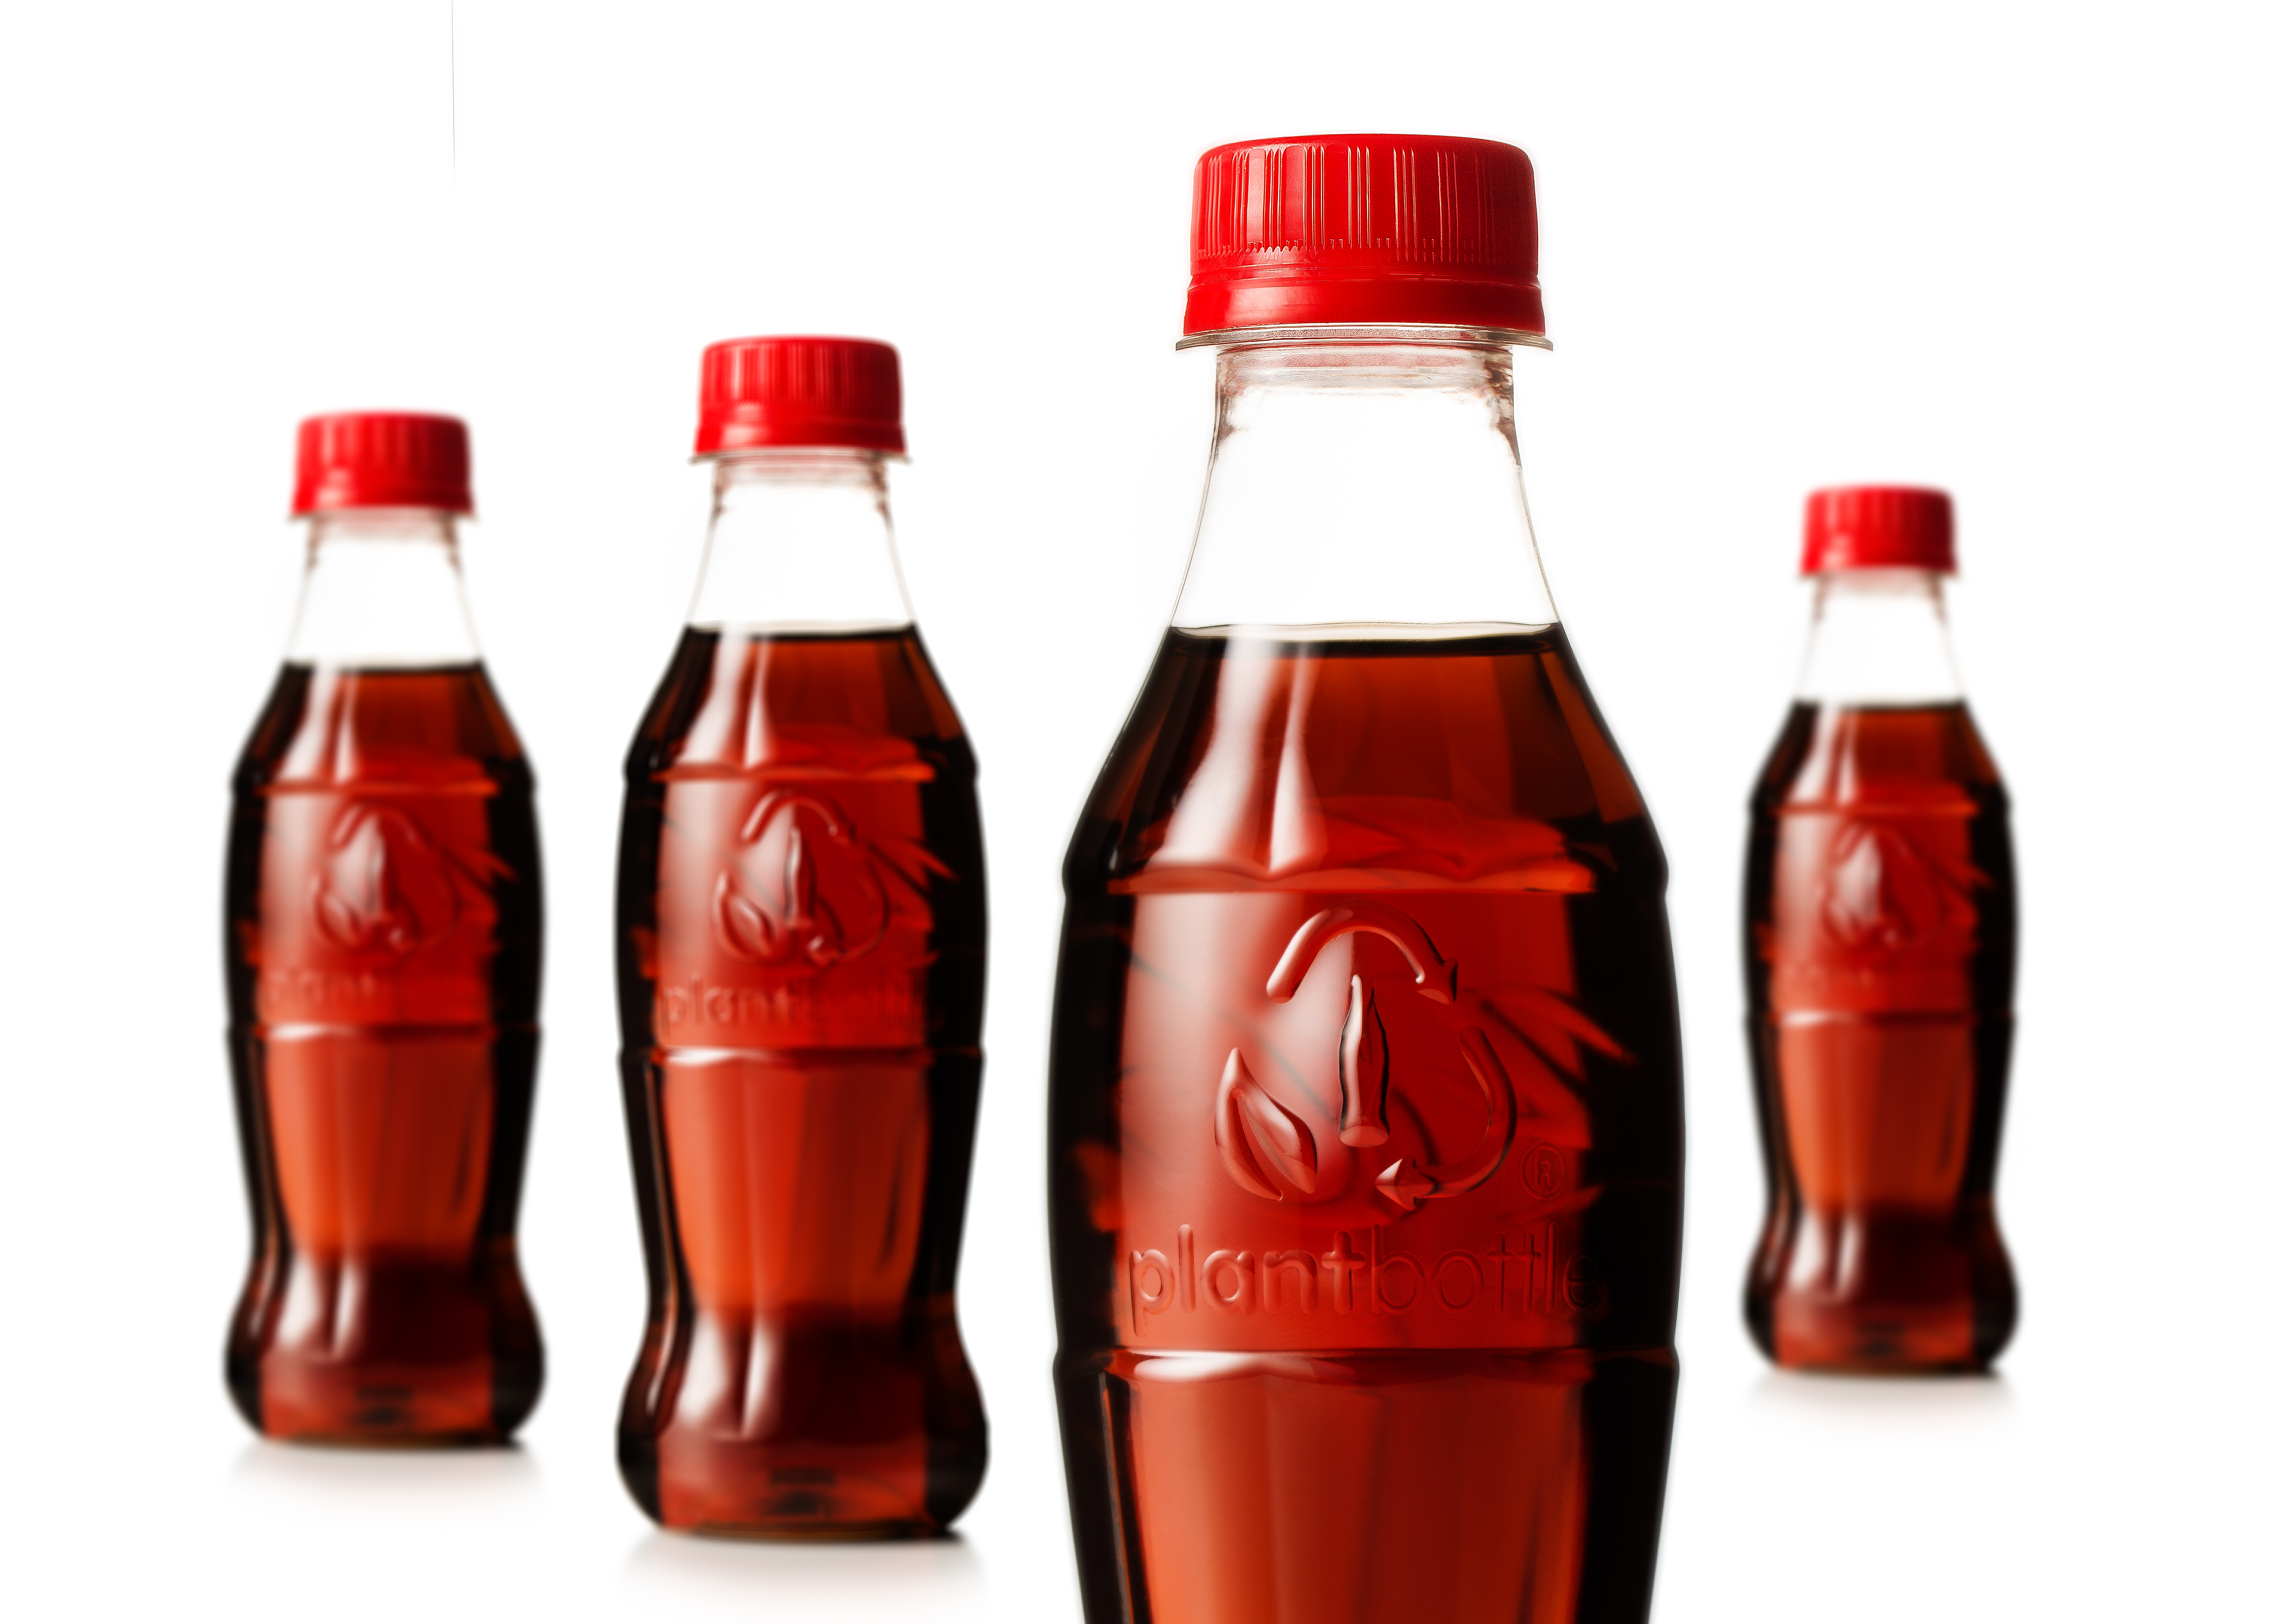 (P) Asa arata prima sticla Coca-Cola facuta exclusiv din plante. Cum a evoluat sticla simbolica in ultimii 100 ani